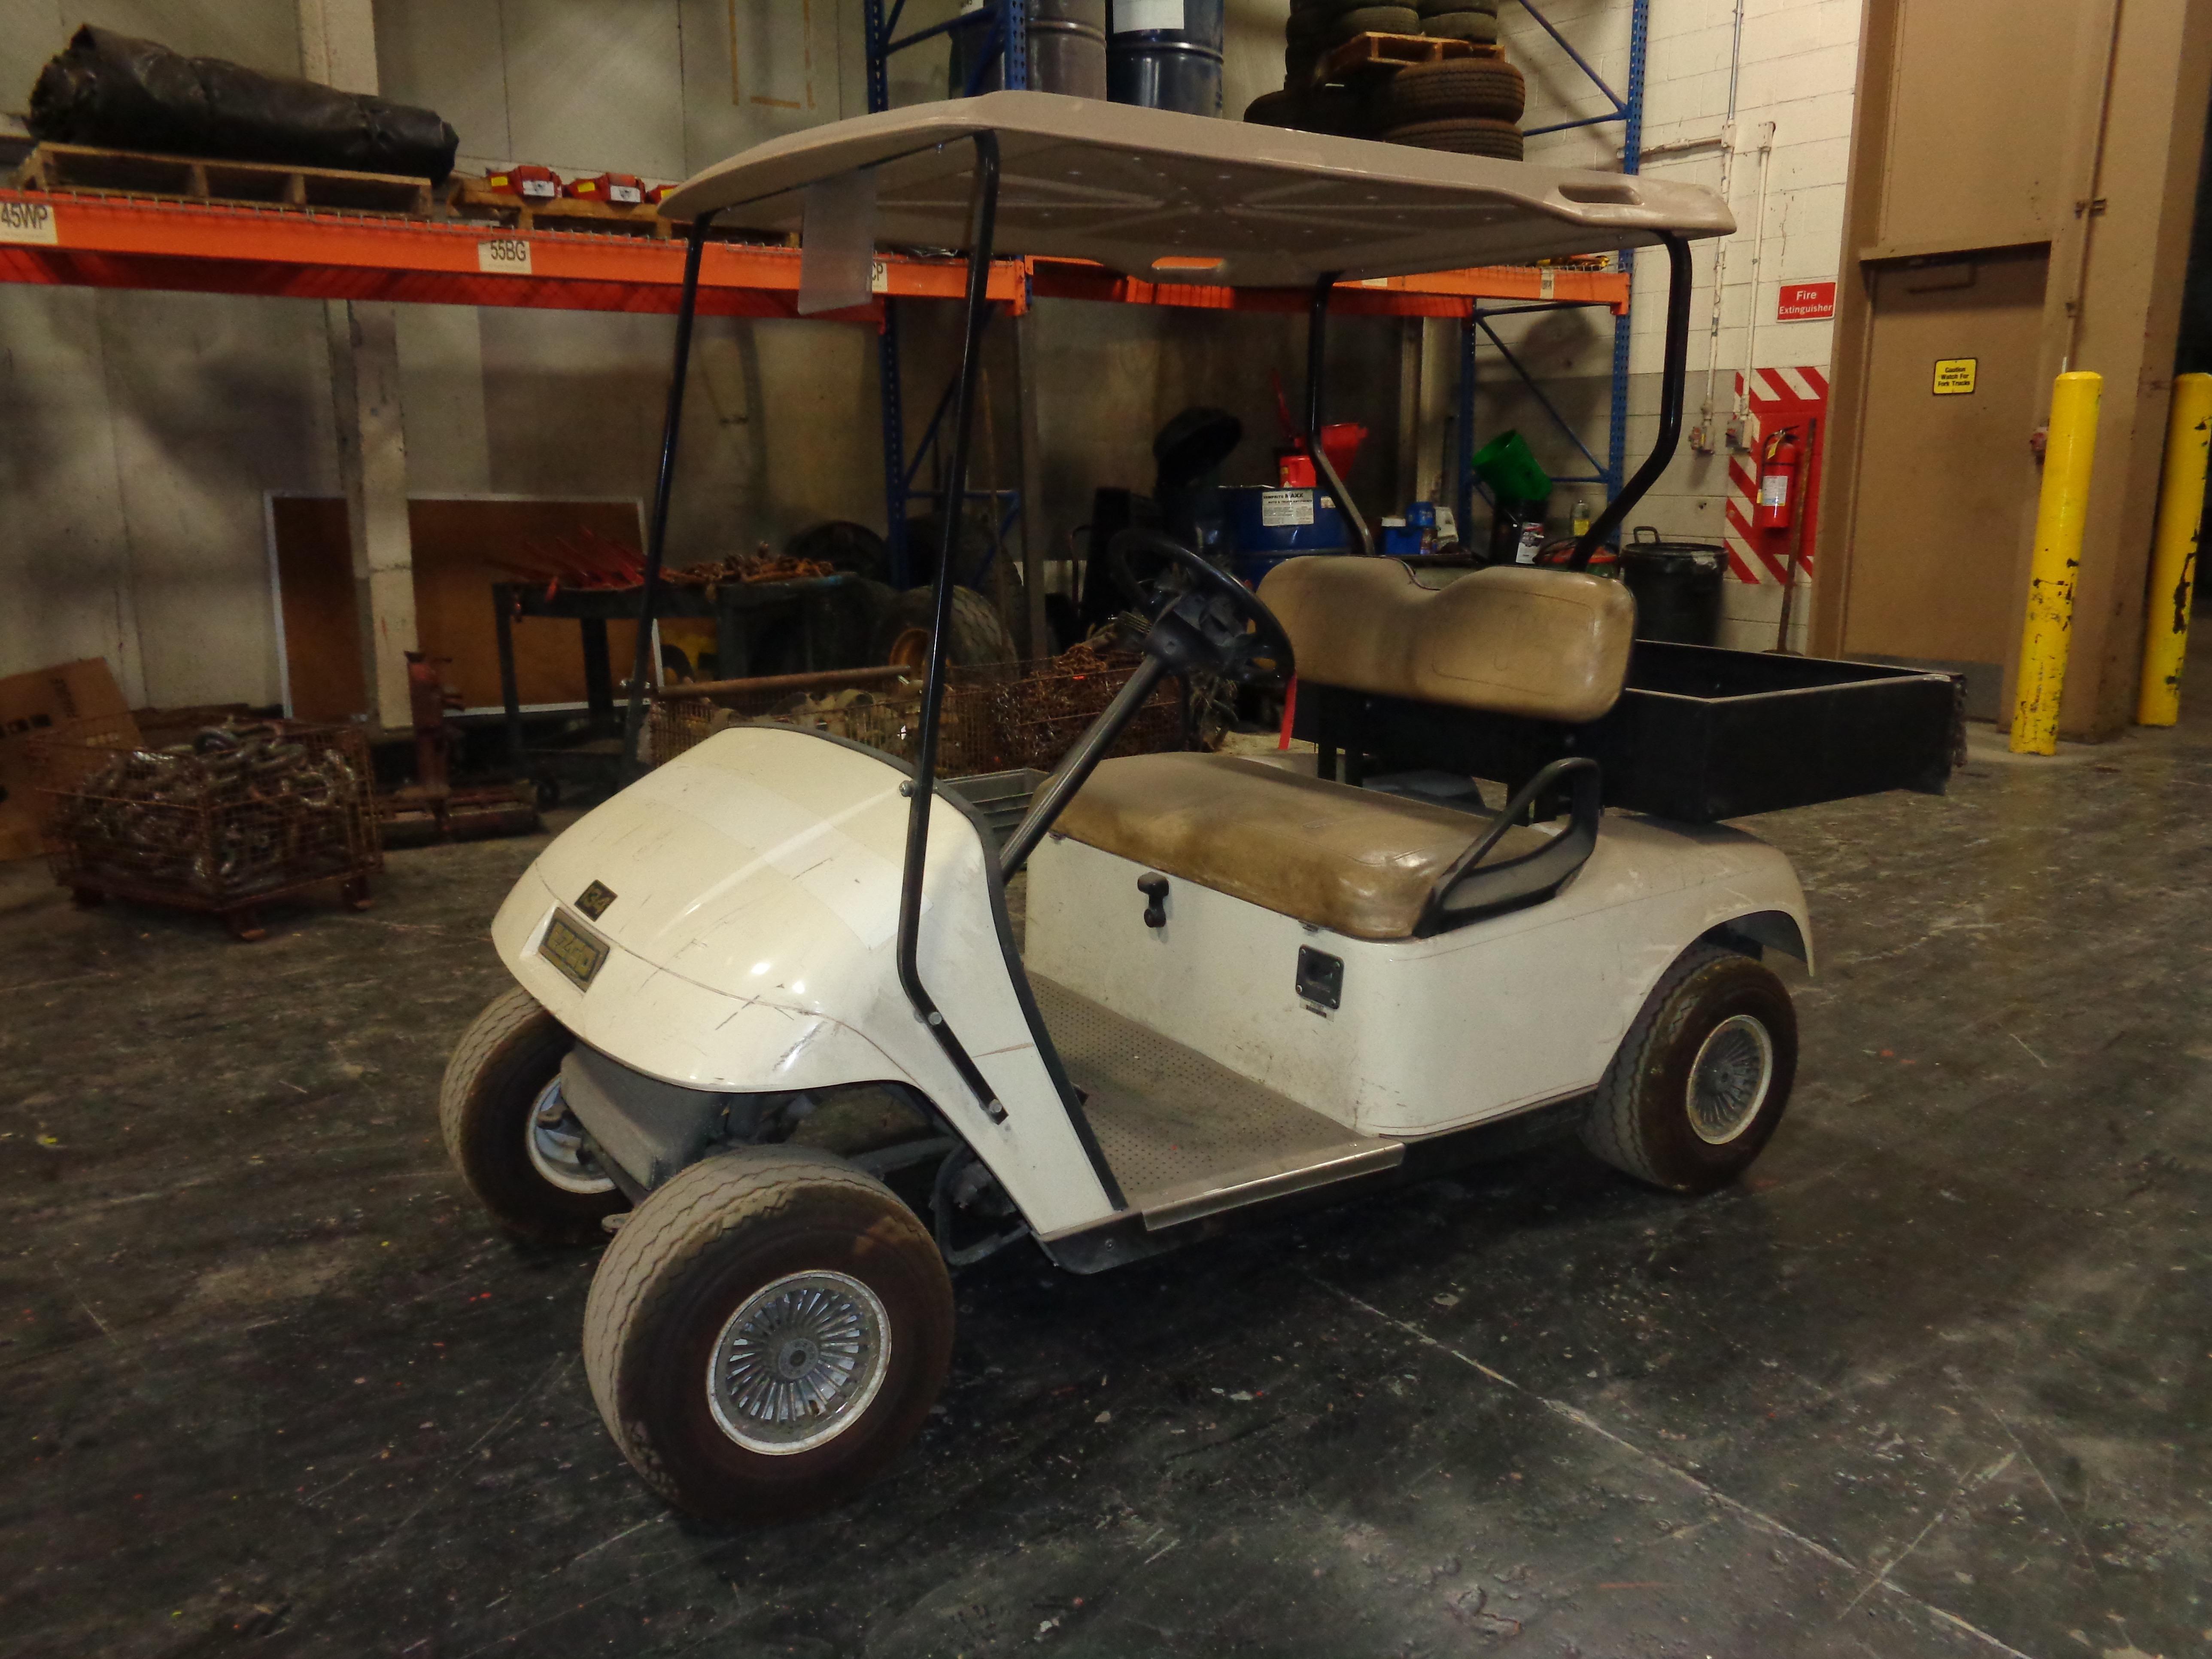 2004 EZGO Golf Cart - Image 2 of 4